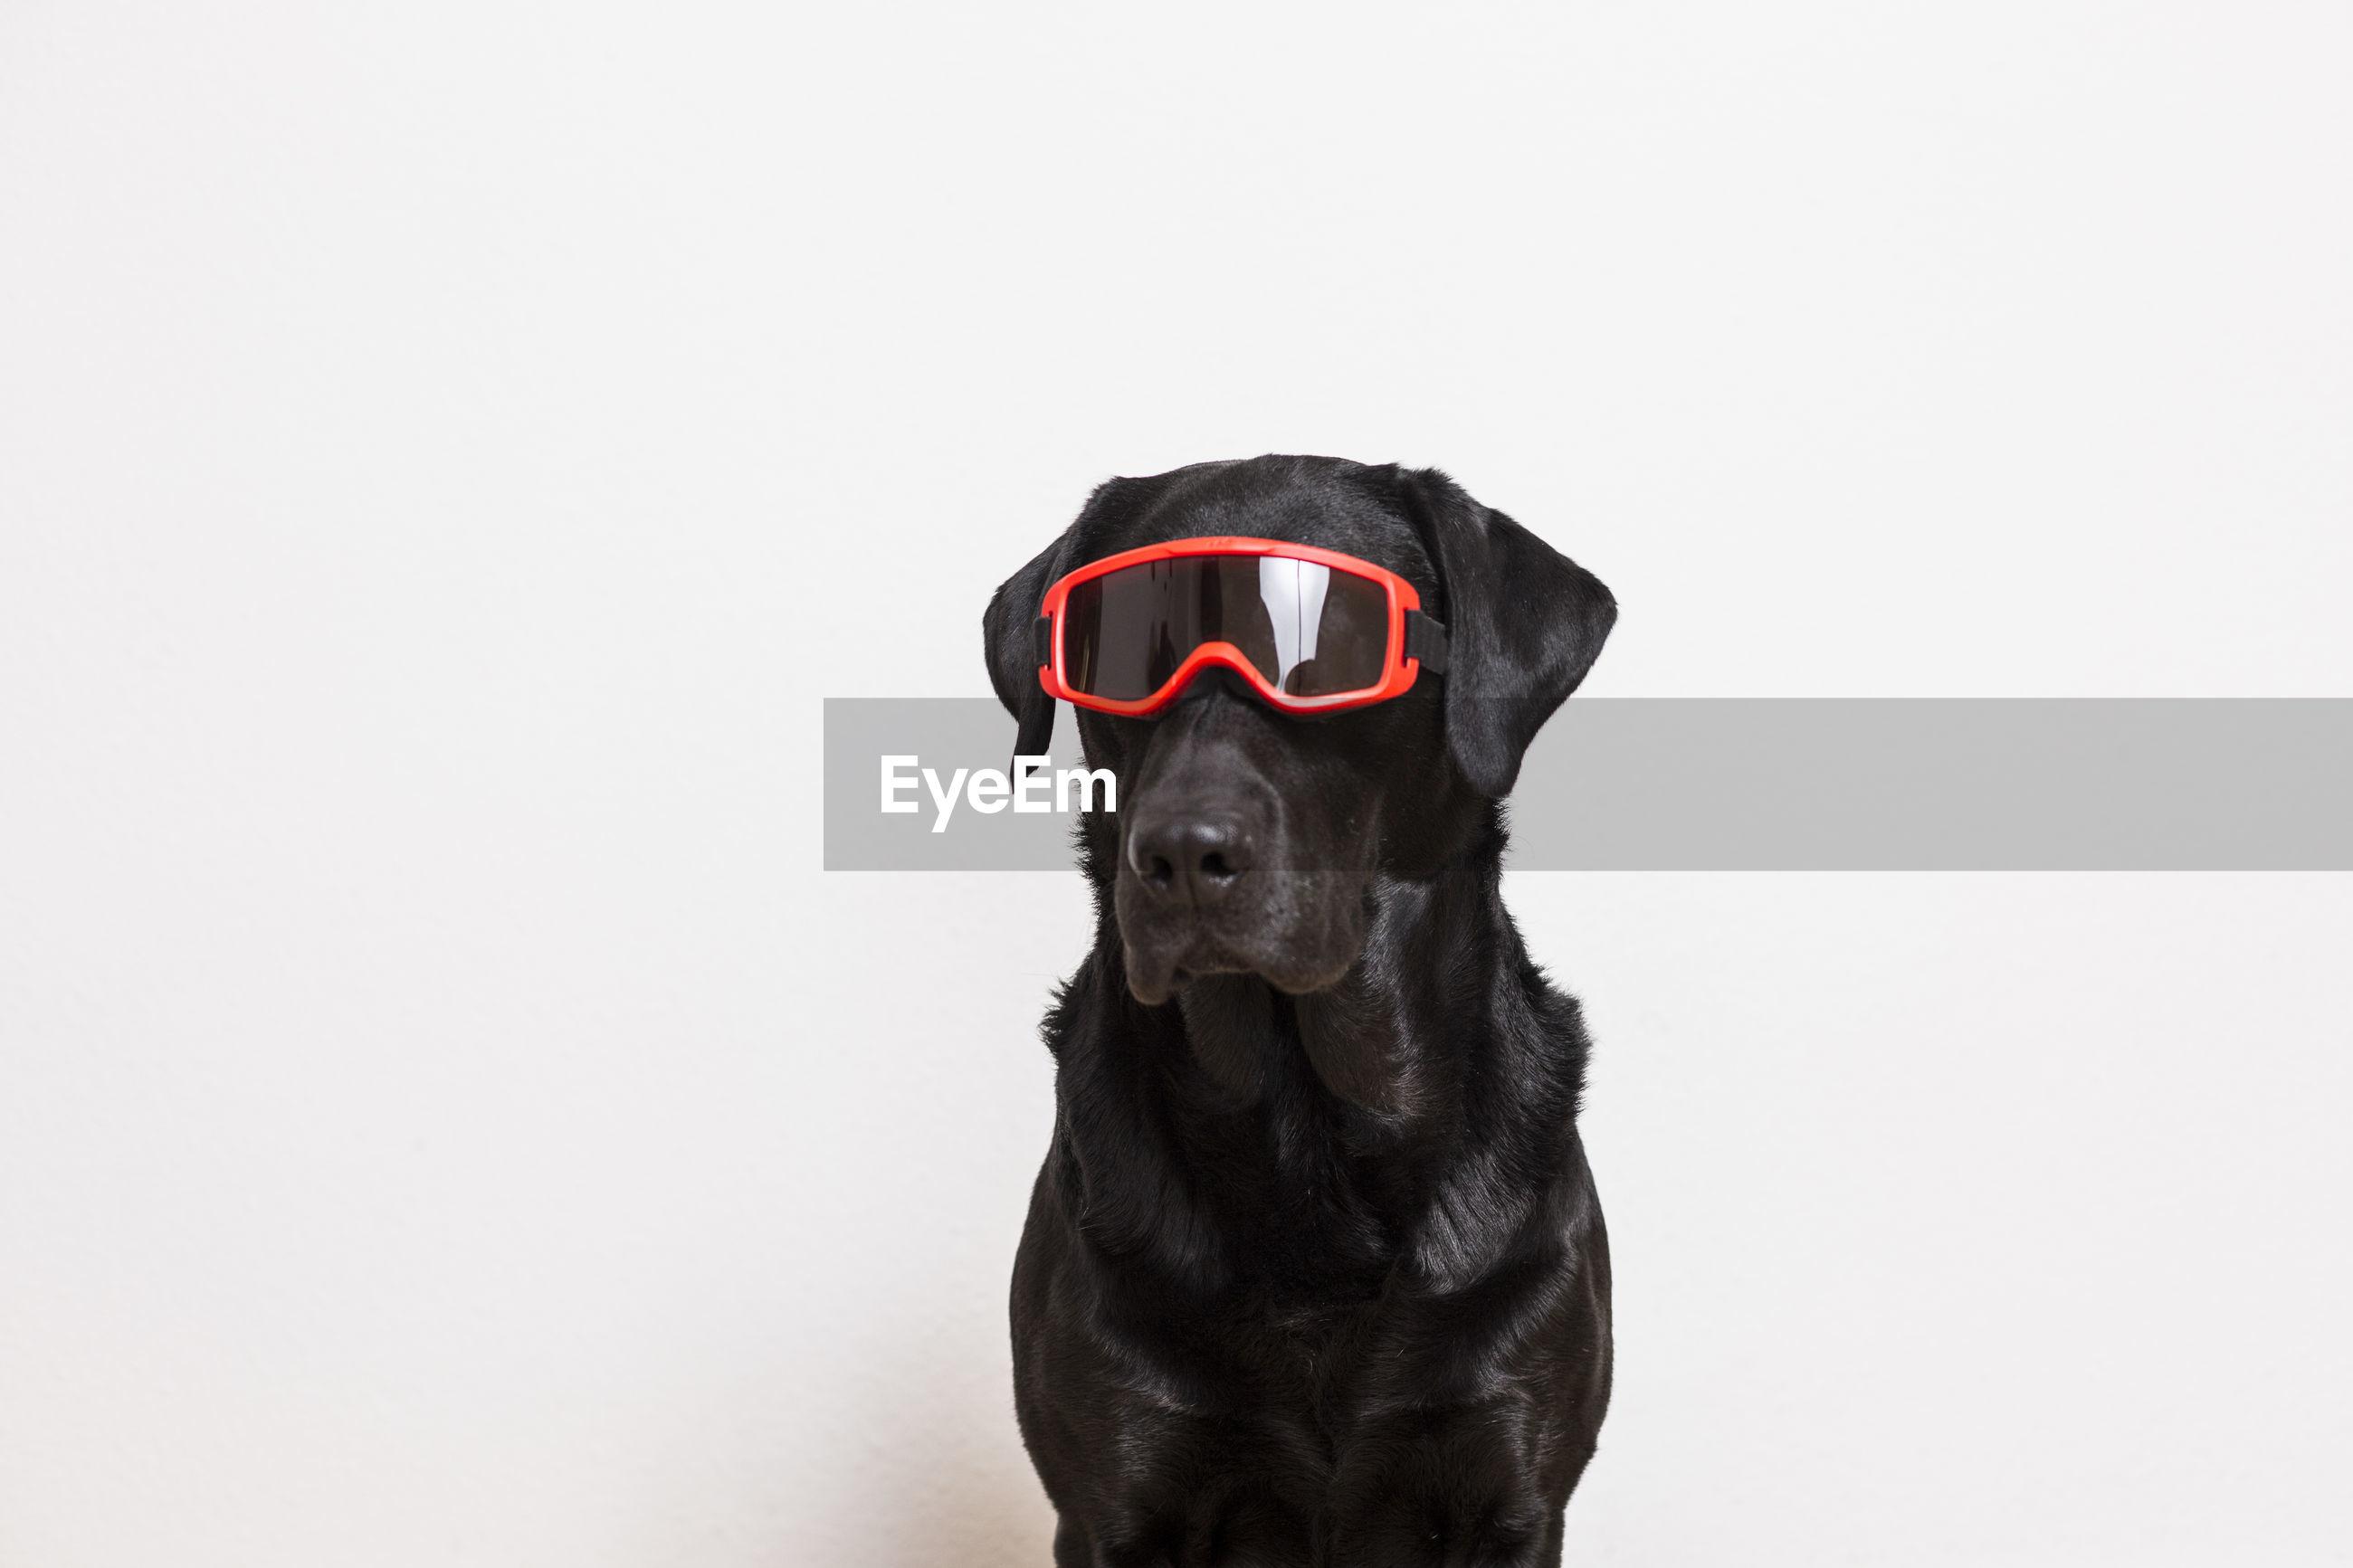 Dog wearing sunglasses against white background